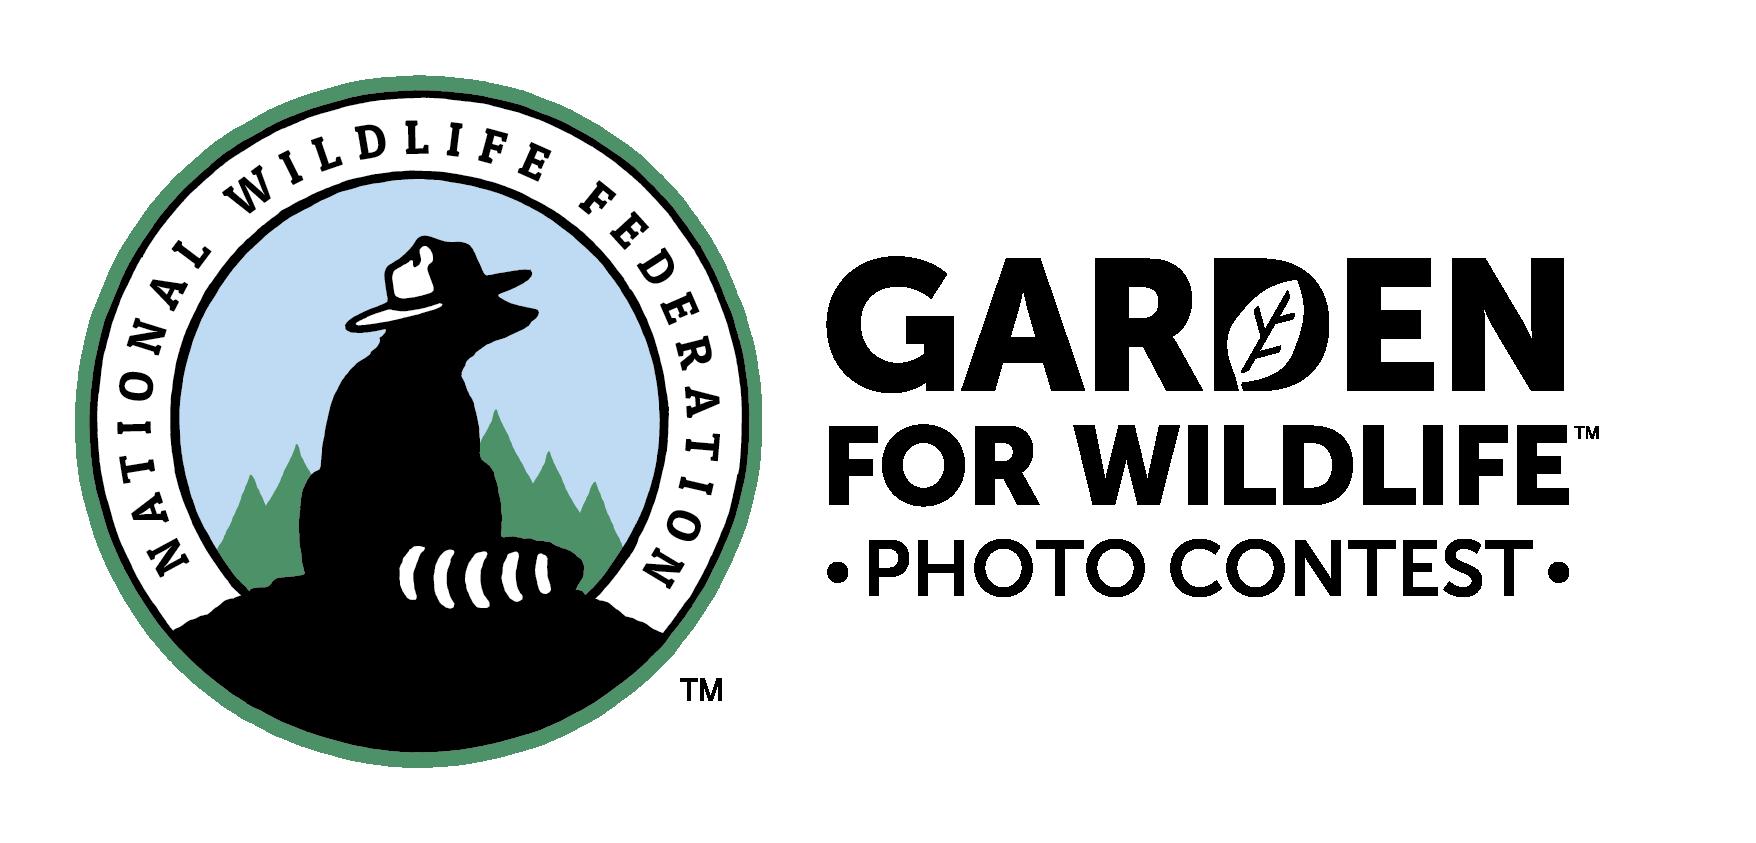 National Wildlife Federation Garden for Wildlife Photo Contest 2019 - logo